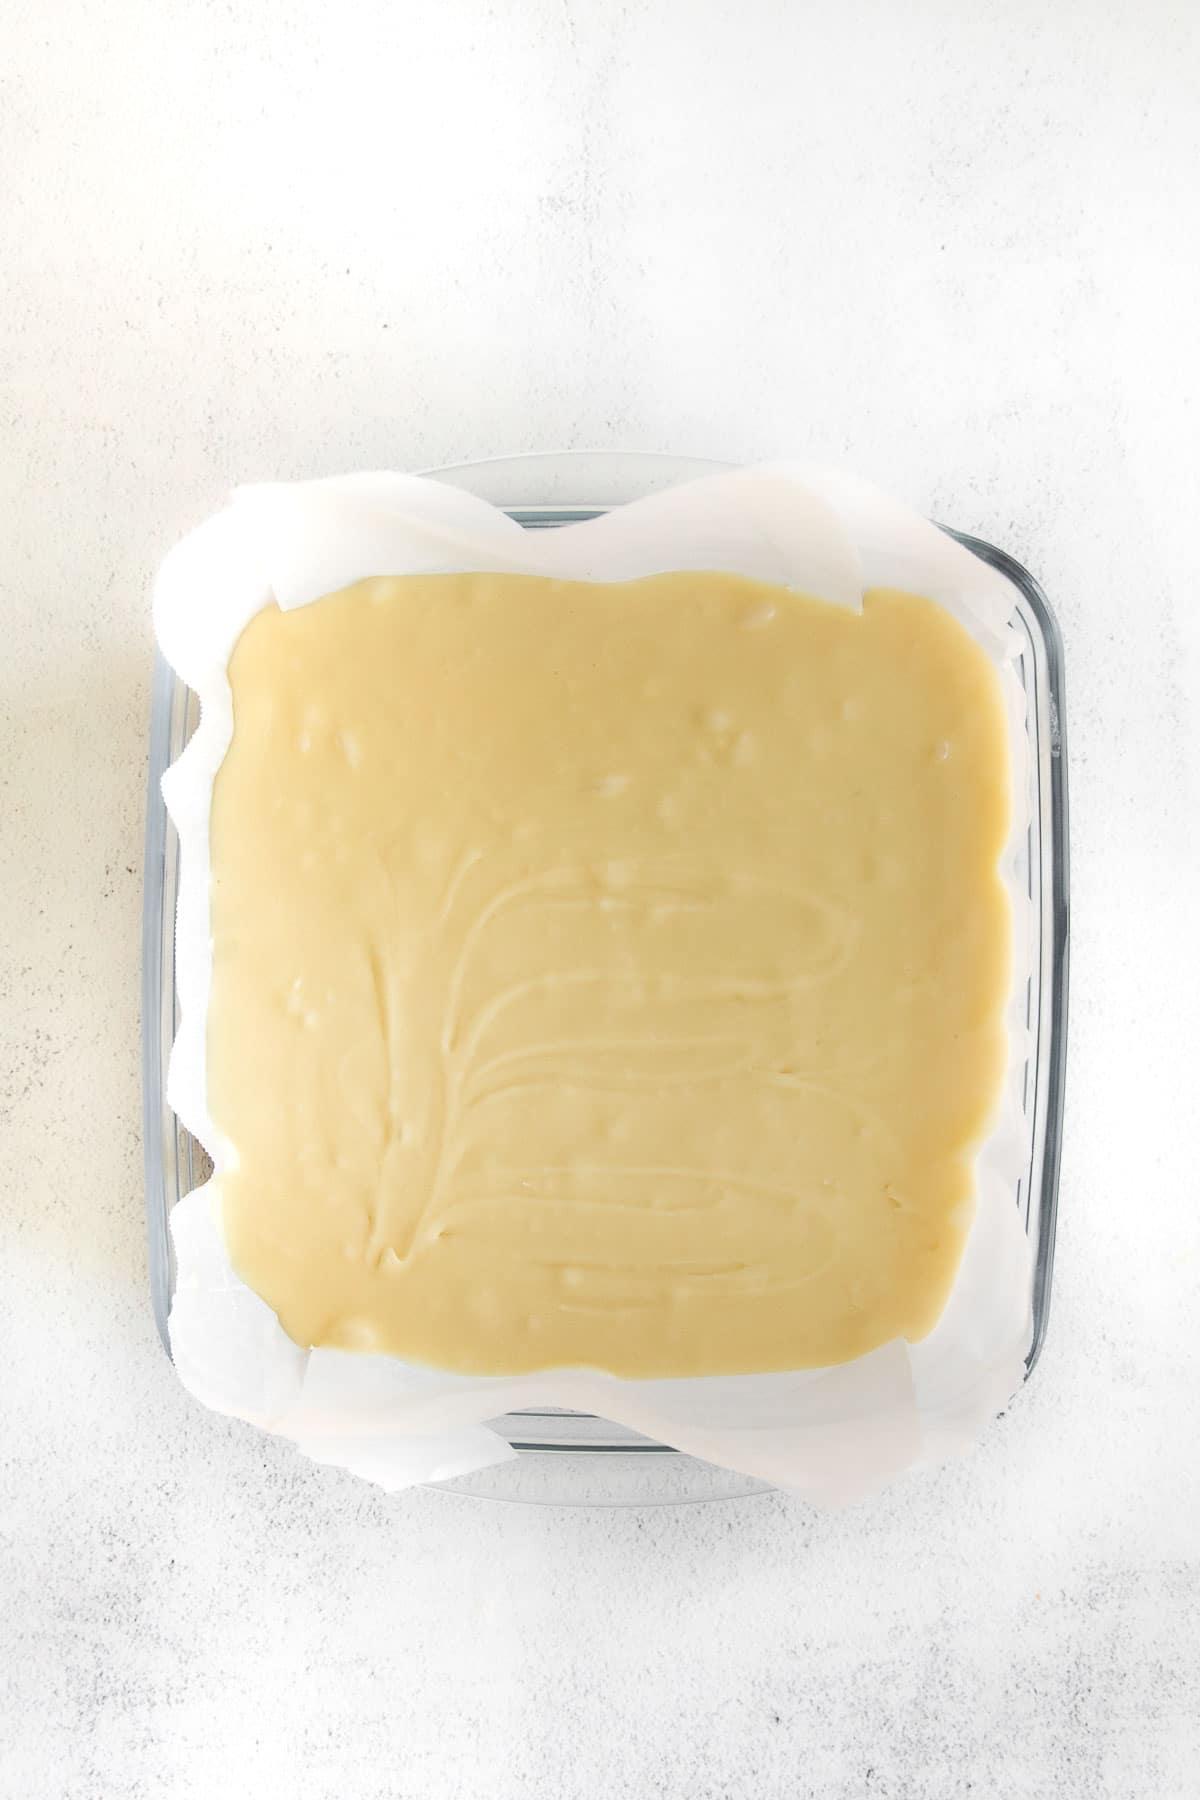 square glass baking dish with vanilla fudge mixture